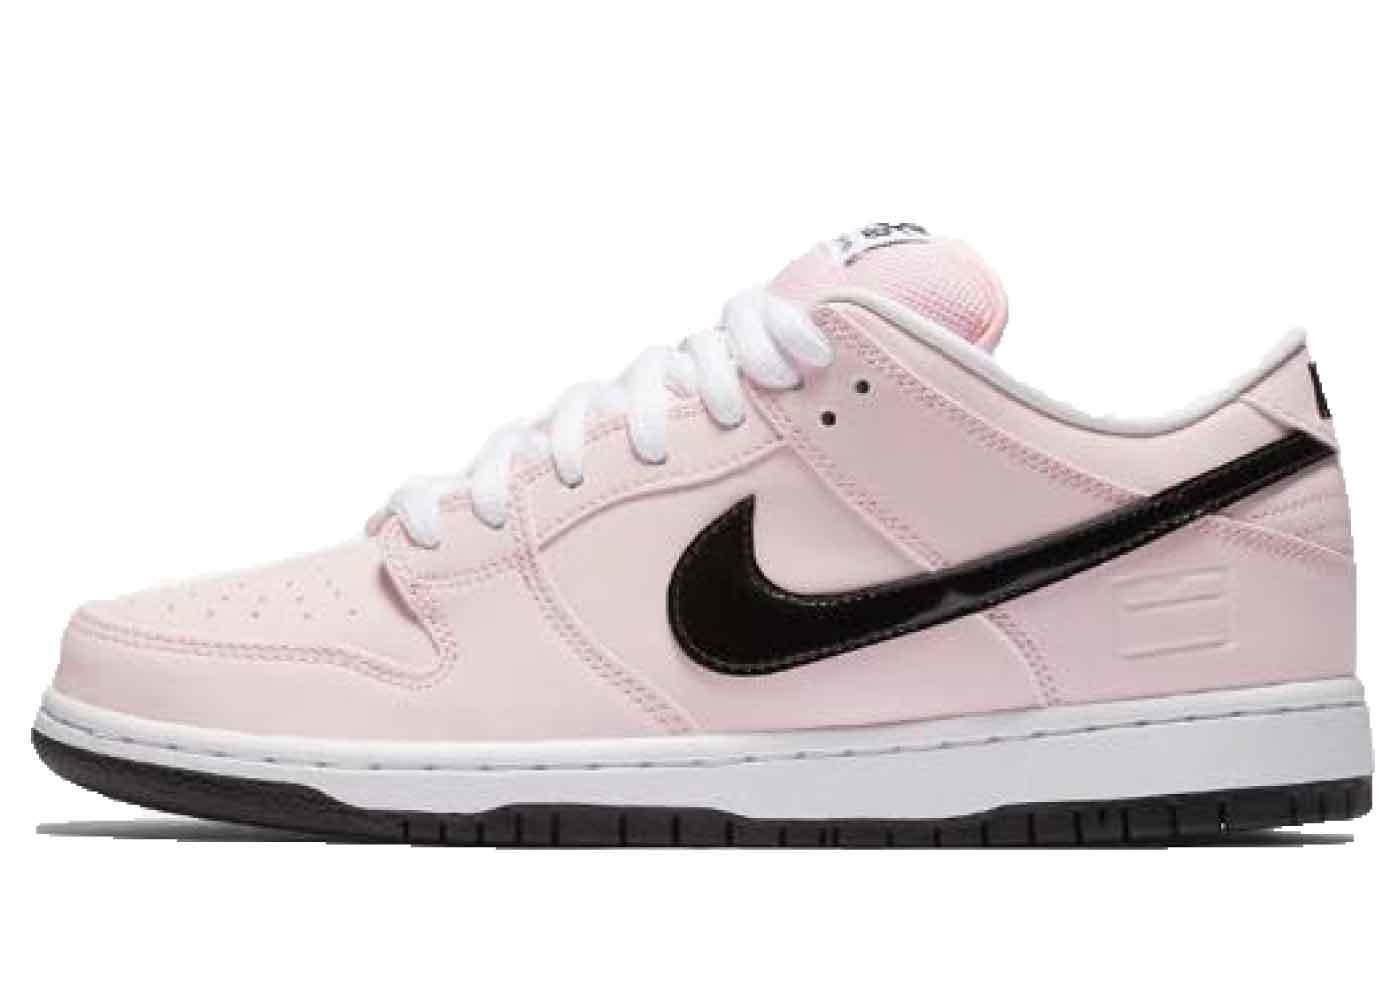 Nike SB Dunk Low Pink Boxの写真